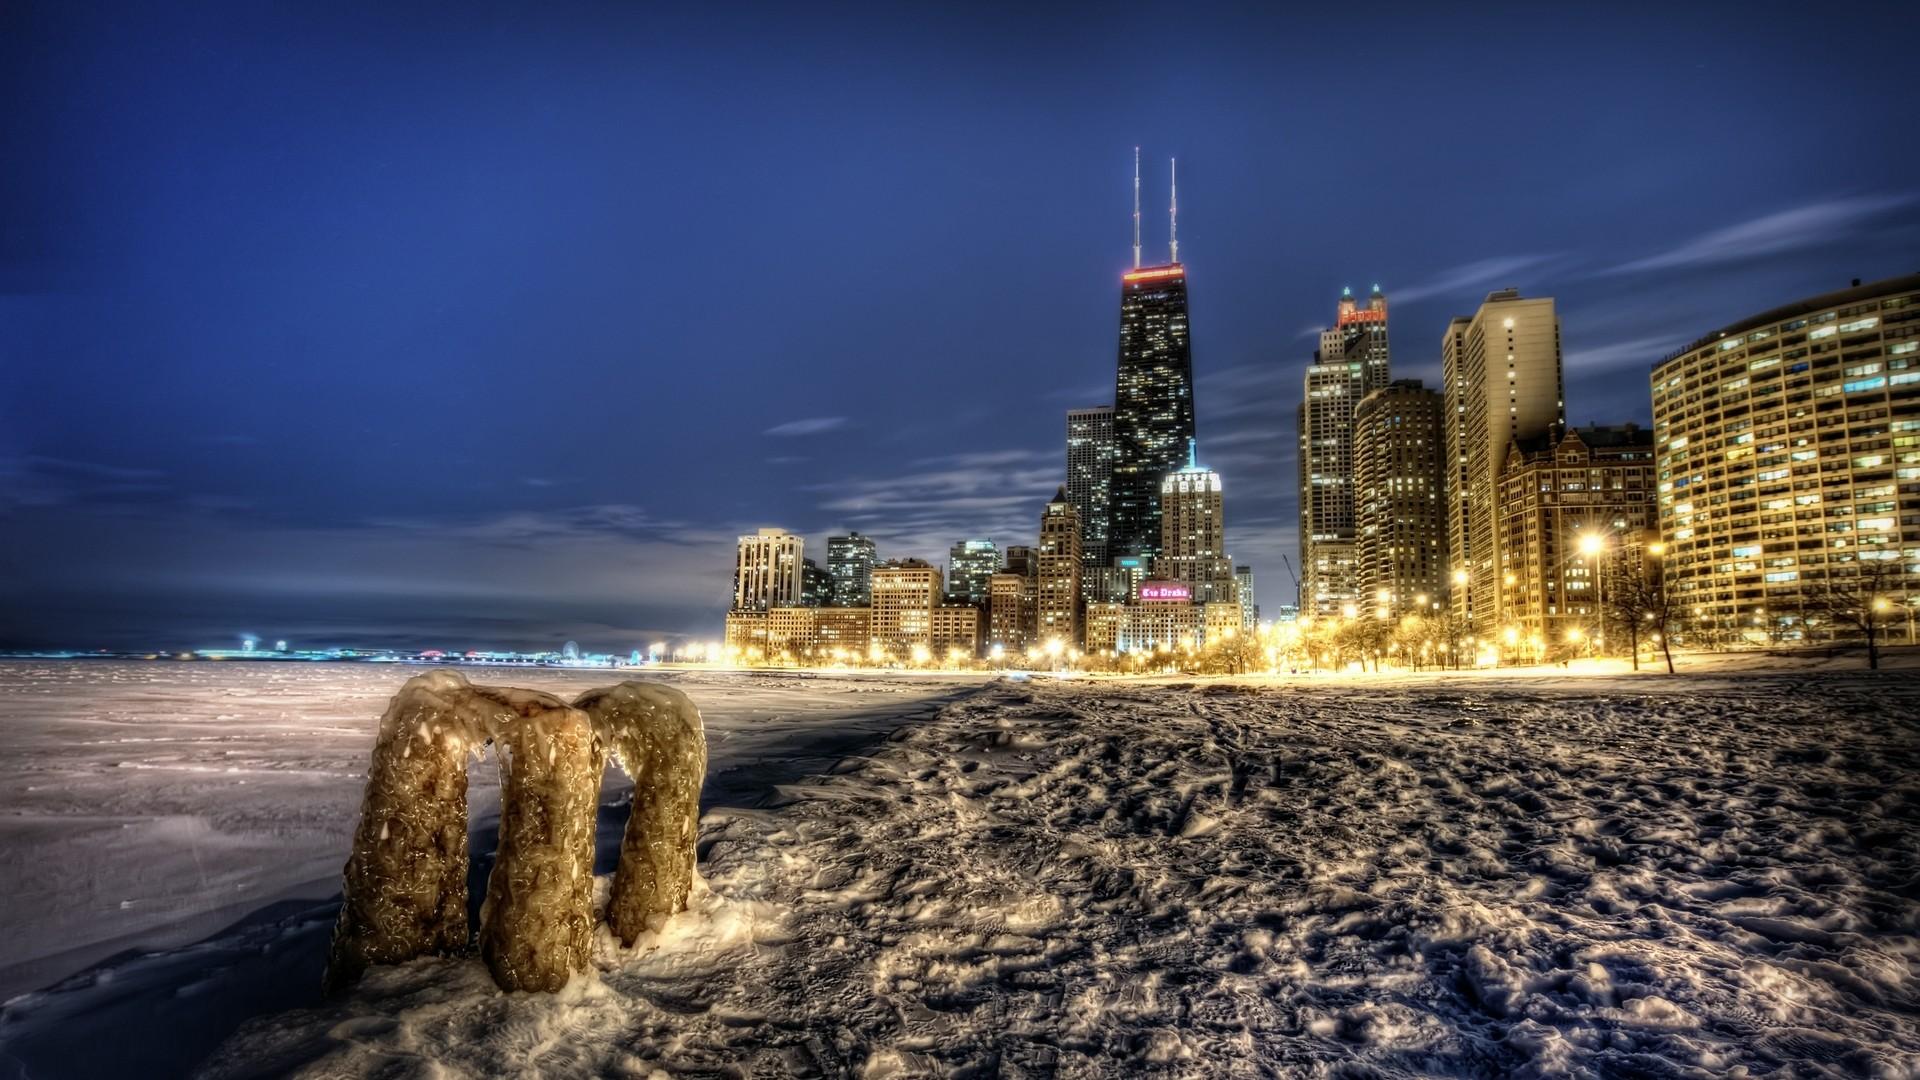 Wallpaper of Chicago ·â'